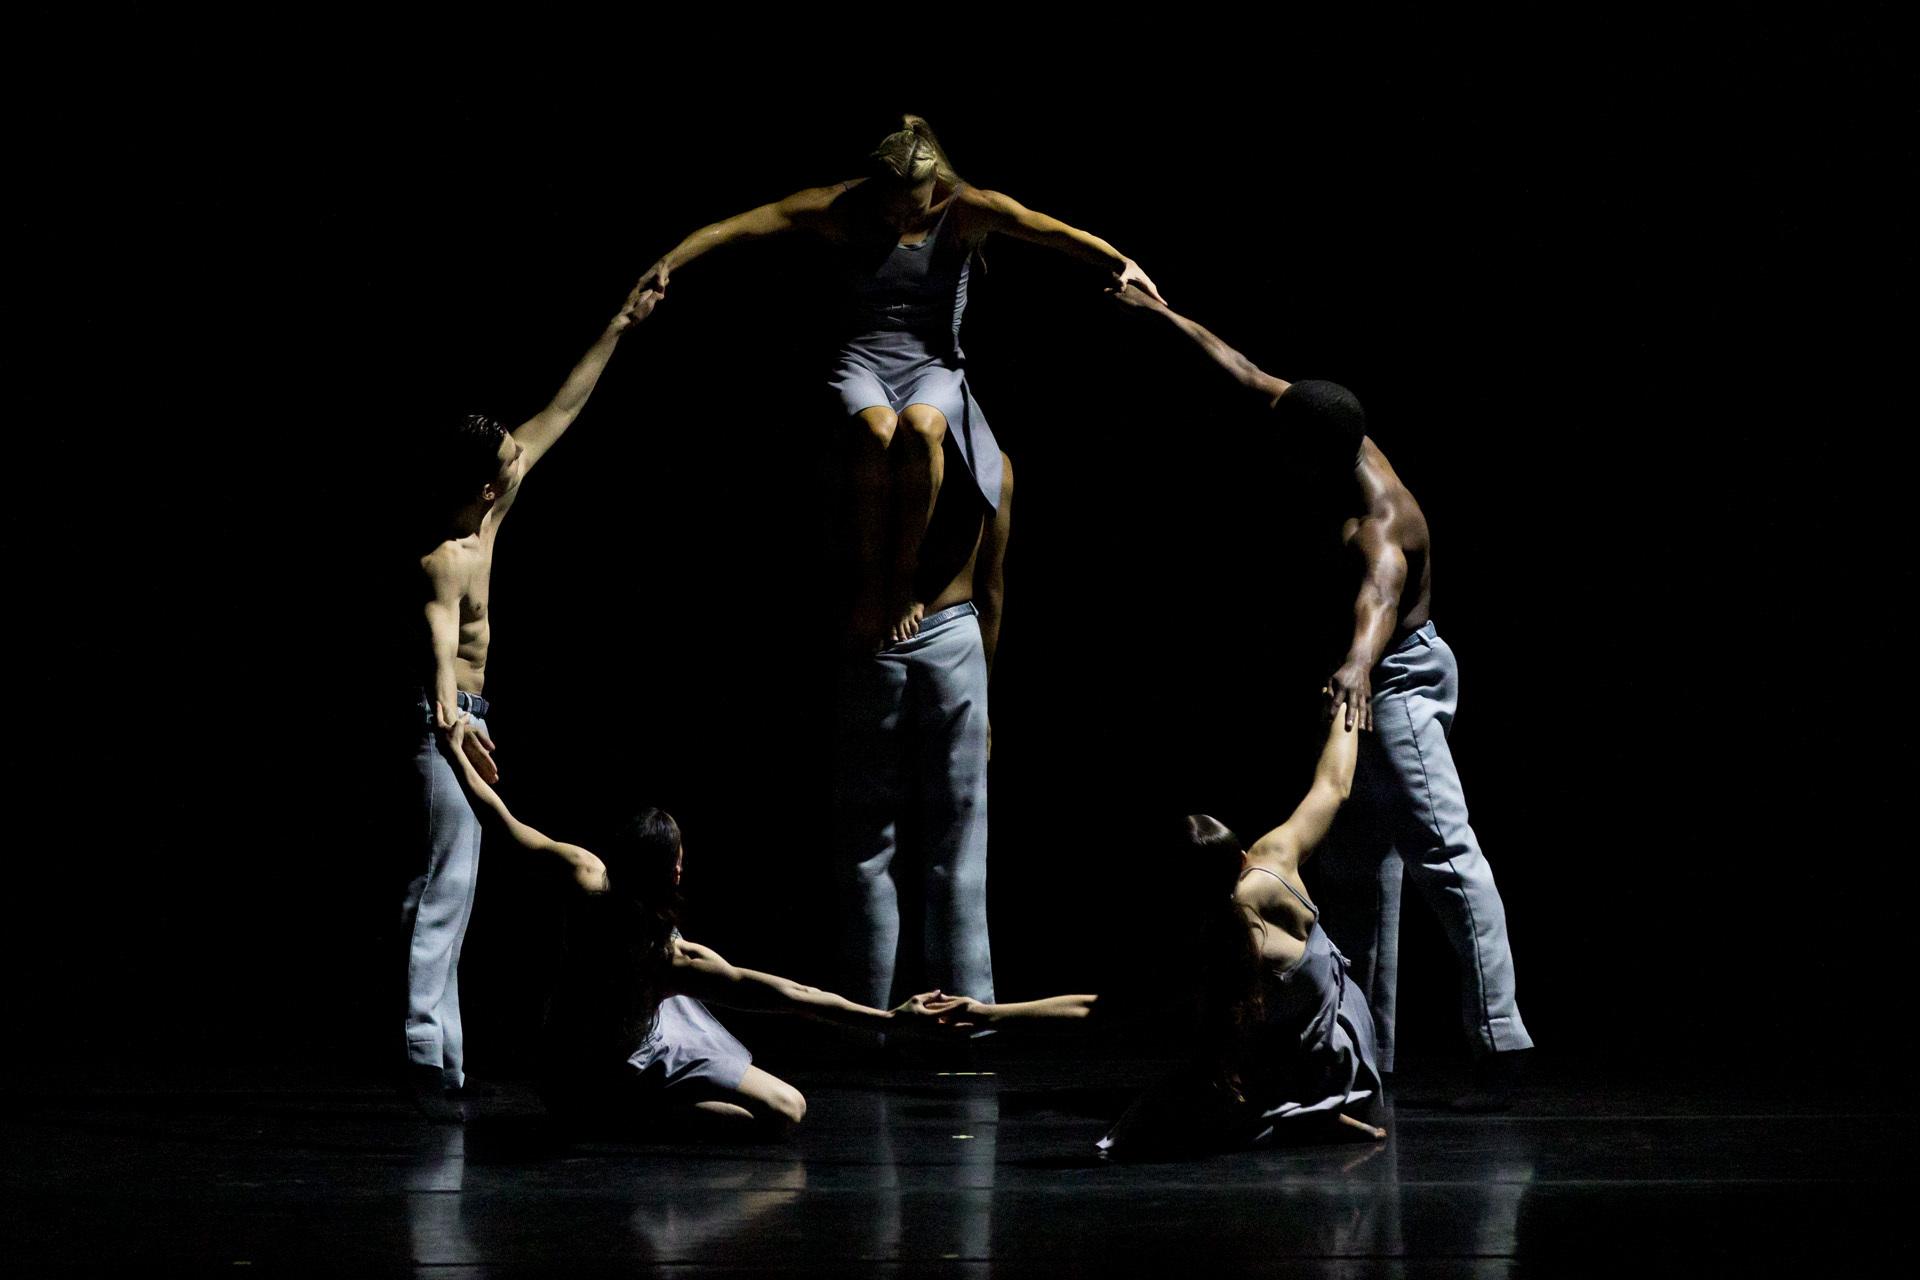 2019_03_01-Parsons-Dance-©-Luca-Vantusso-211136-EOSR0292